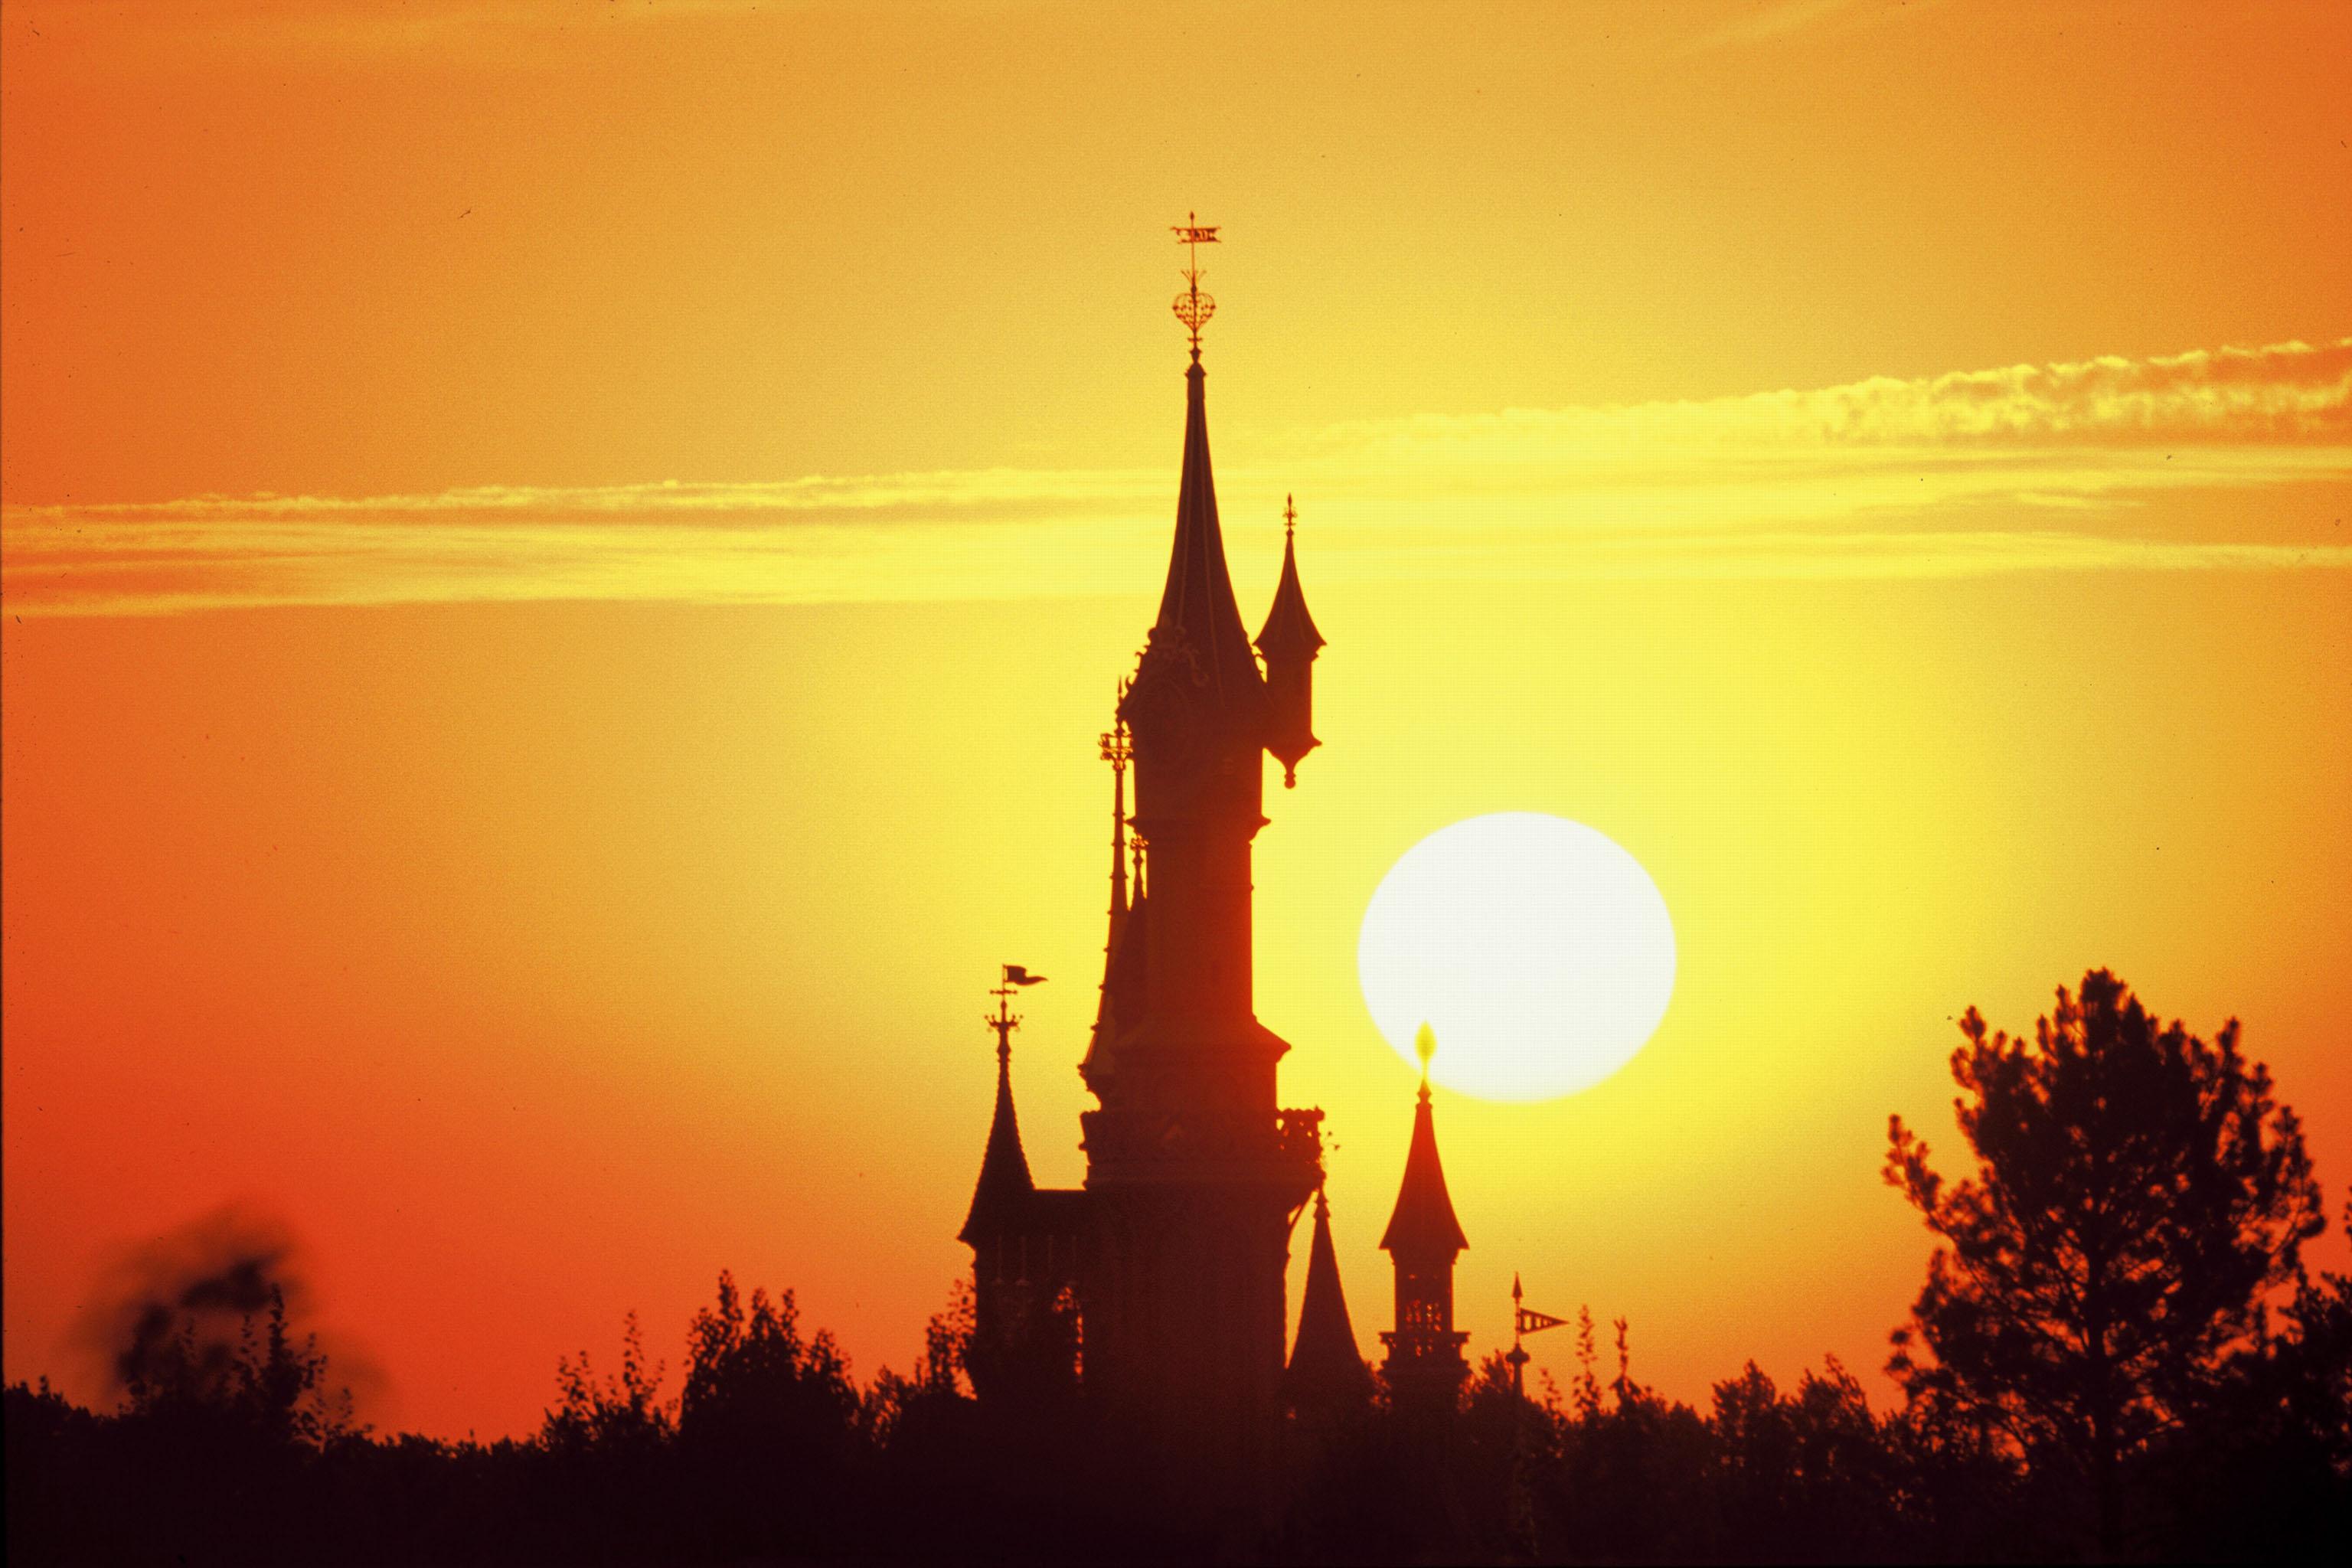 Sleeping Beauty Castle at Sunset